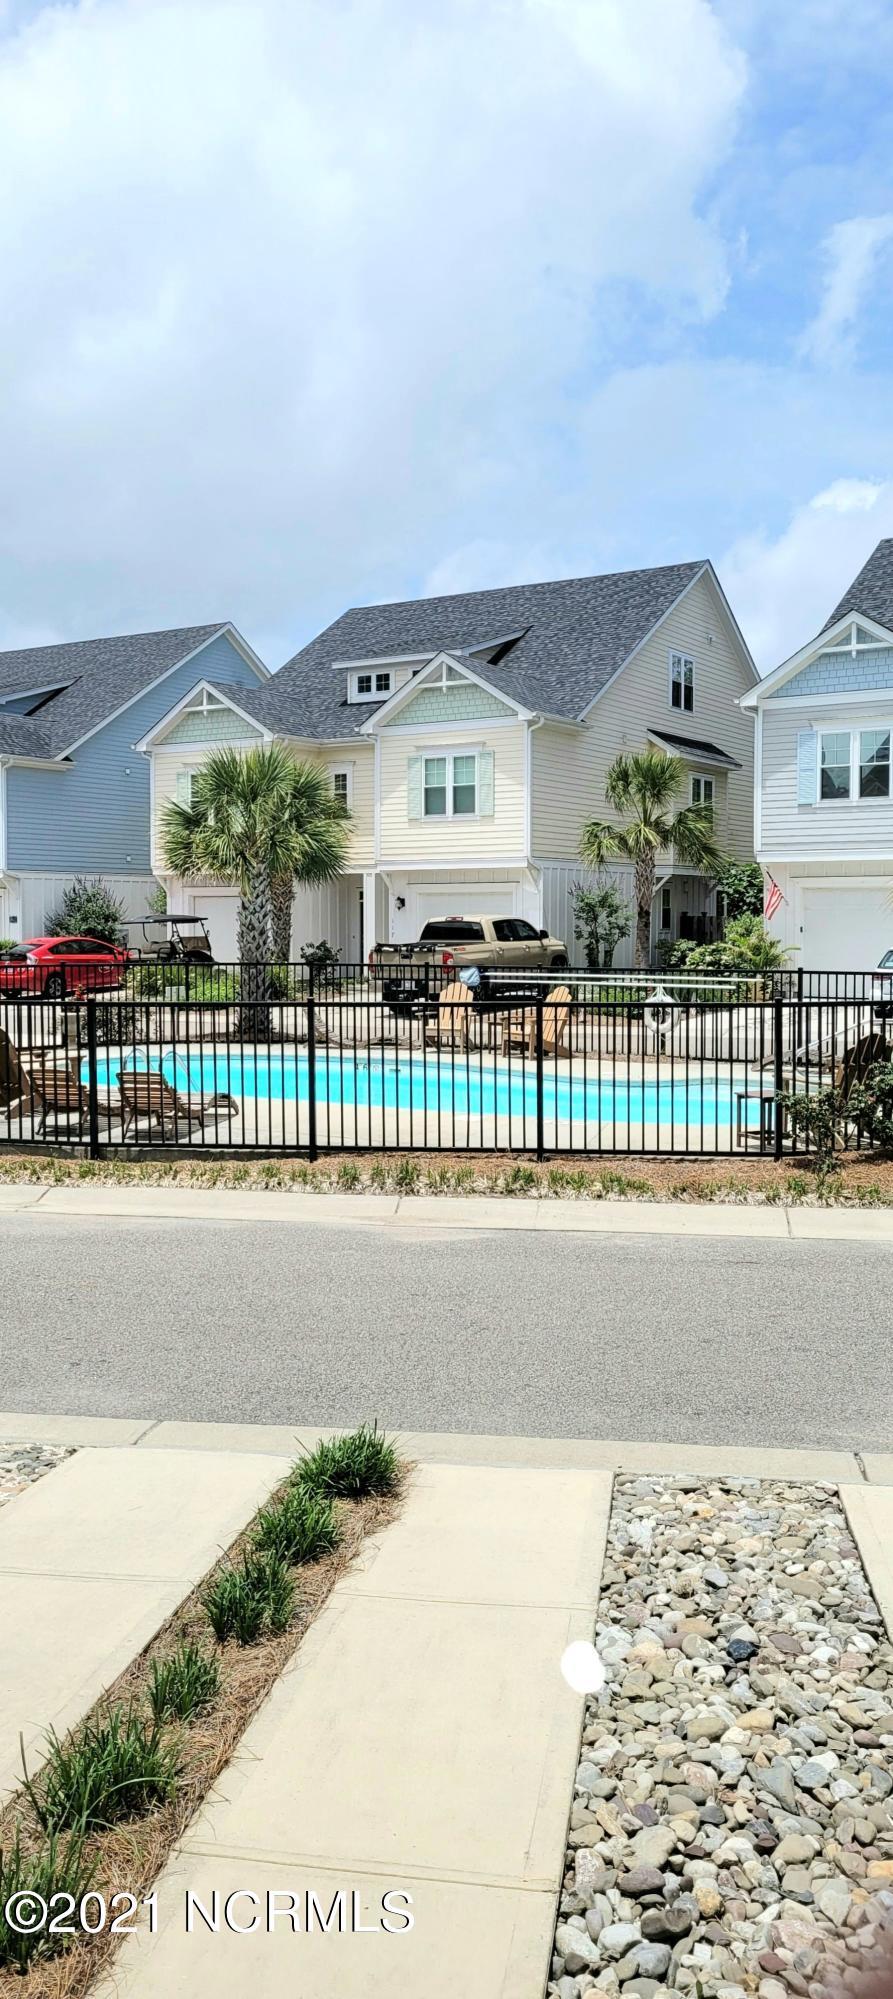 111 Bimini Townes Lane, Carolina Beach, North Carolina 28428, 3 Bedrooms Bedrooms, 9 Rooms Rooms,3 BathroomsBathrooms,Townhouse,For sale,Bimini Townes,100279492